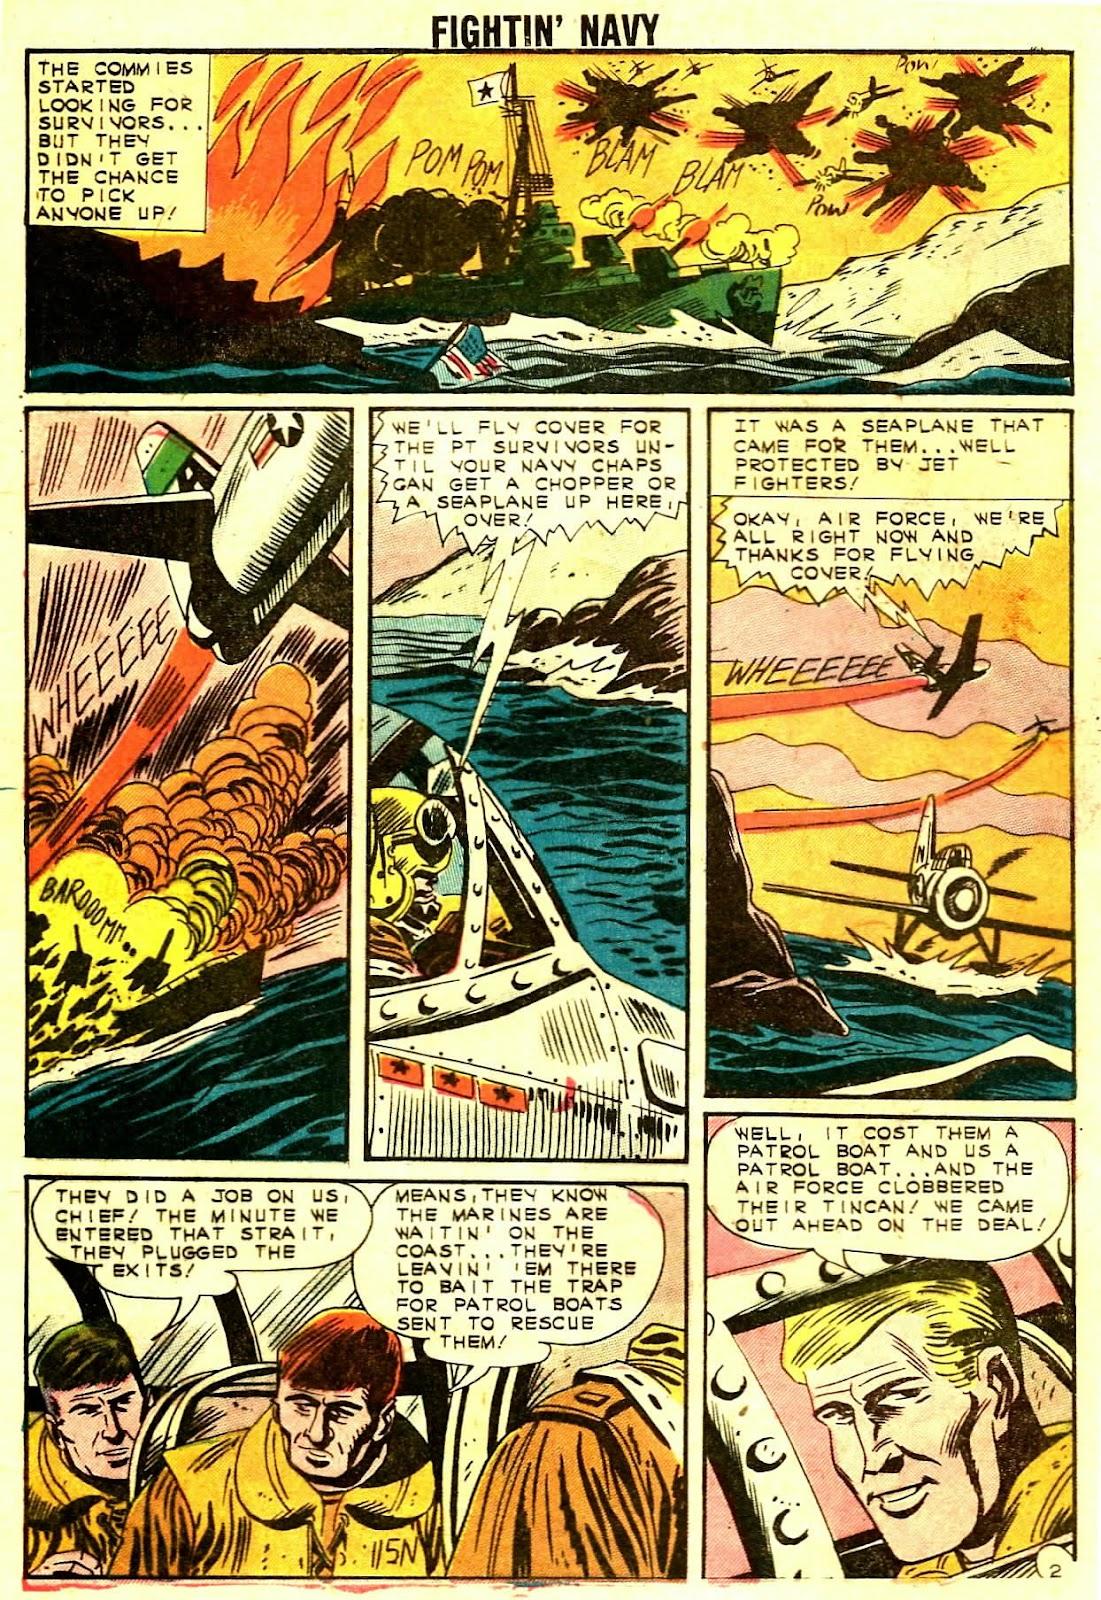 Read online Fightin' Navy comic -  Issue #109 - 4